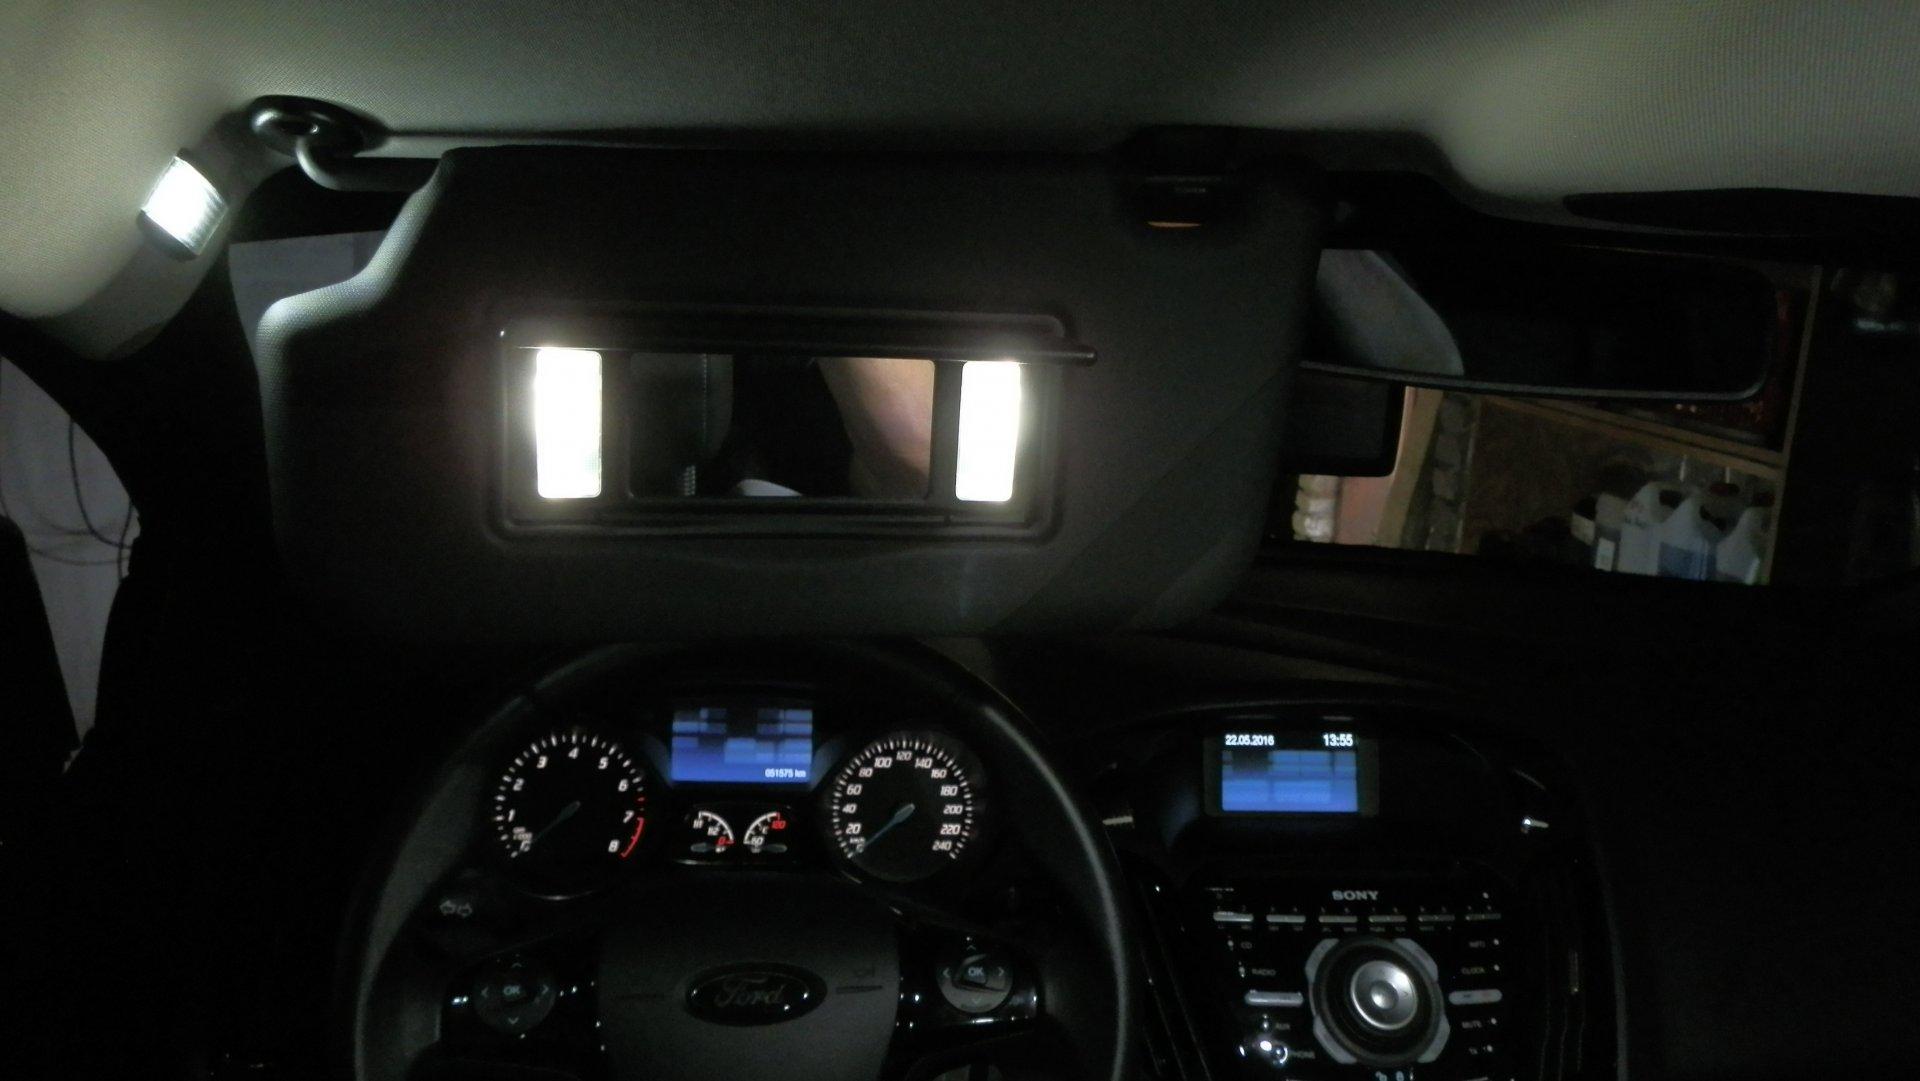 Ford Focus III (2016-05-22) - LED-Make-up-Spiegel-Schminkspiegelbeleuchtung - Bild 8.JPG